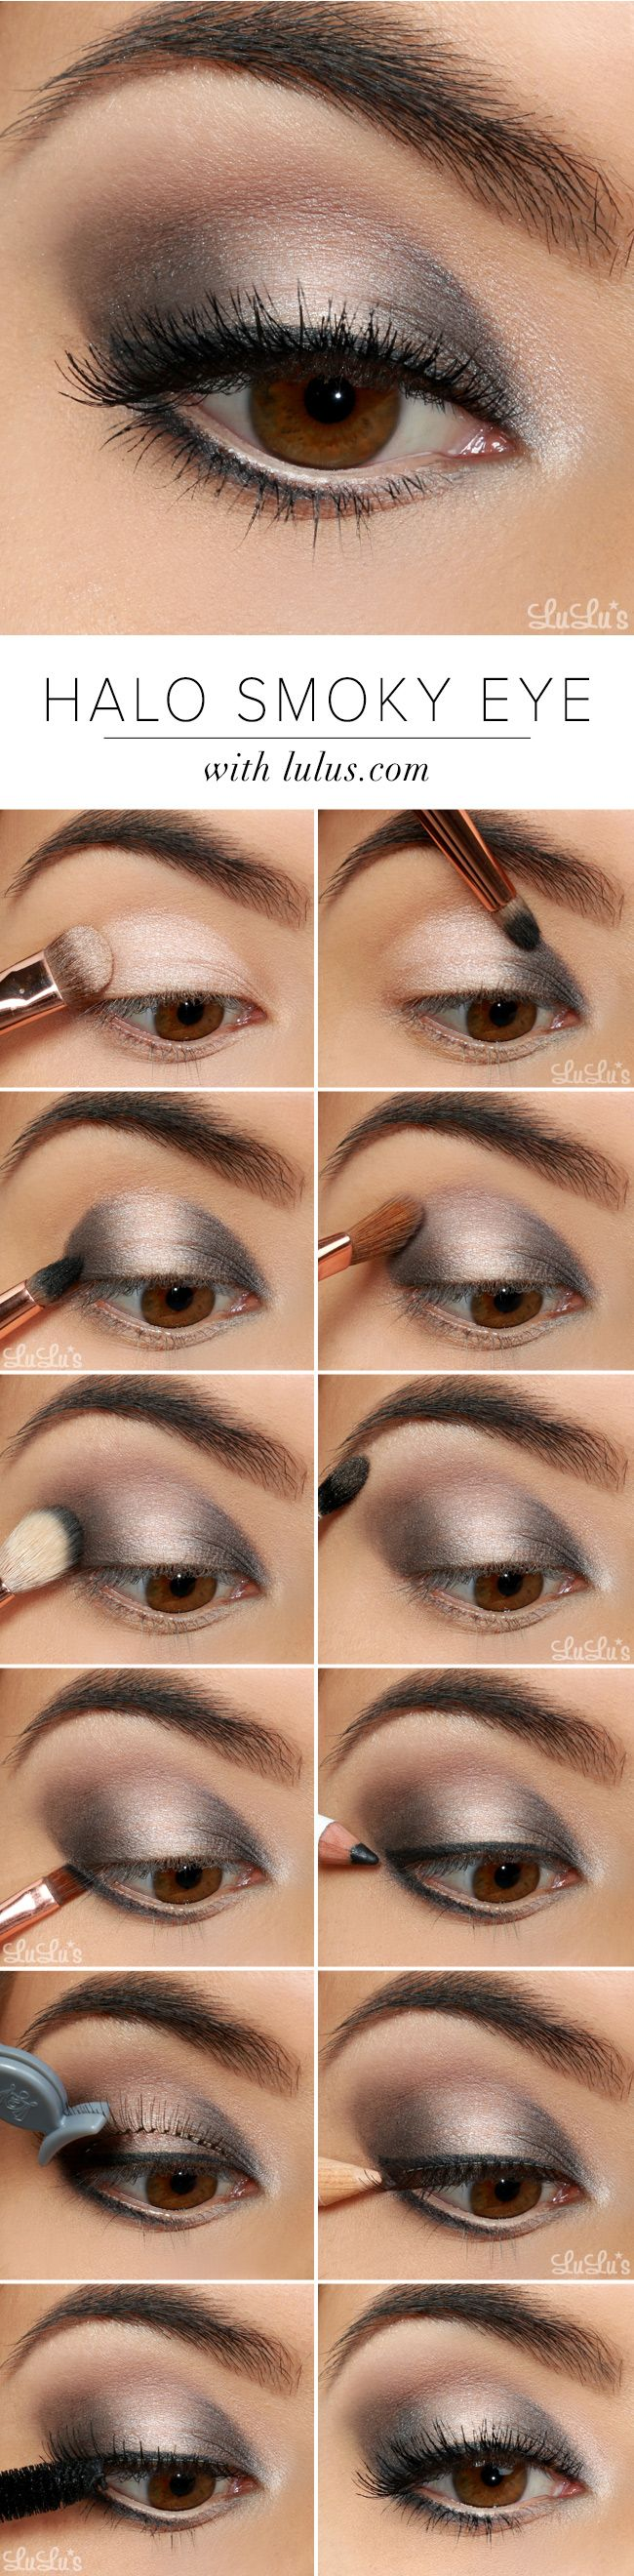 Lulus Howto: Halo Smokey Eye Shadow Tutorial